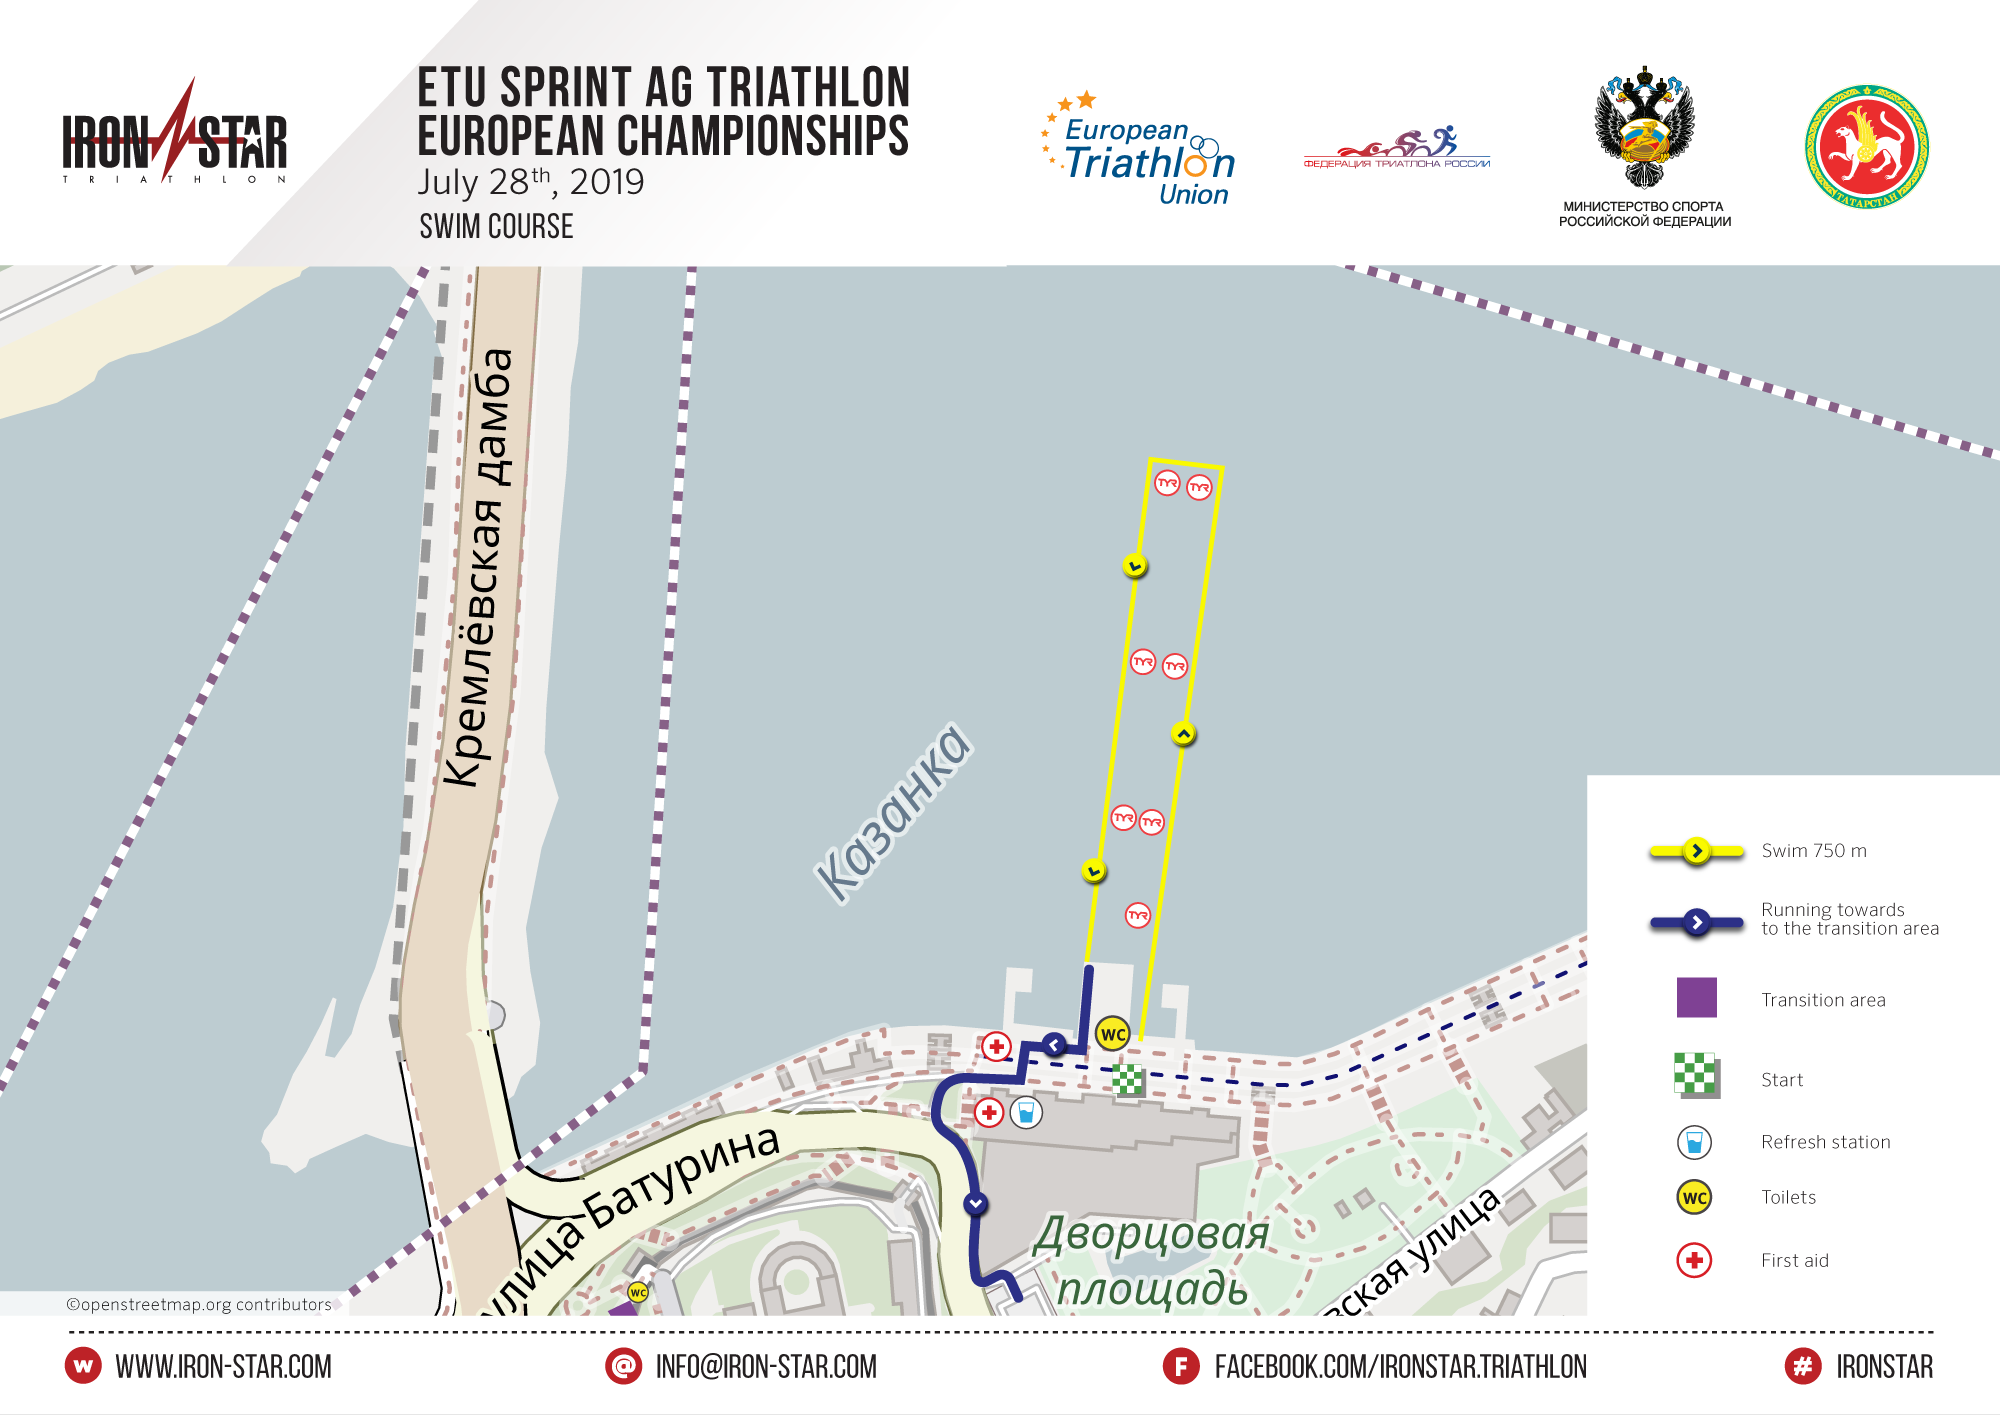 2019 Kazan ETU Sprint Triathlon European Championships | Triathlon org